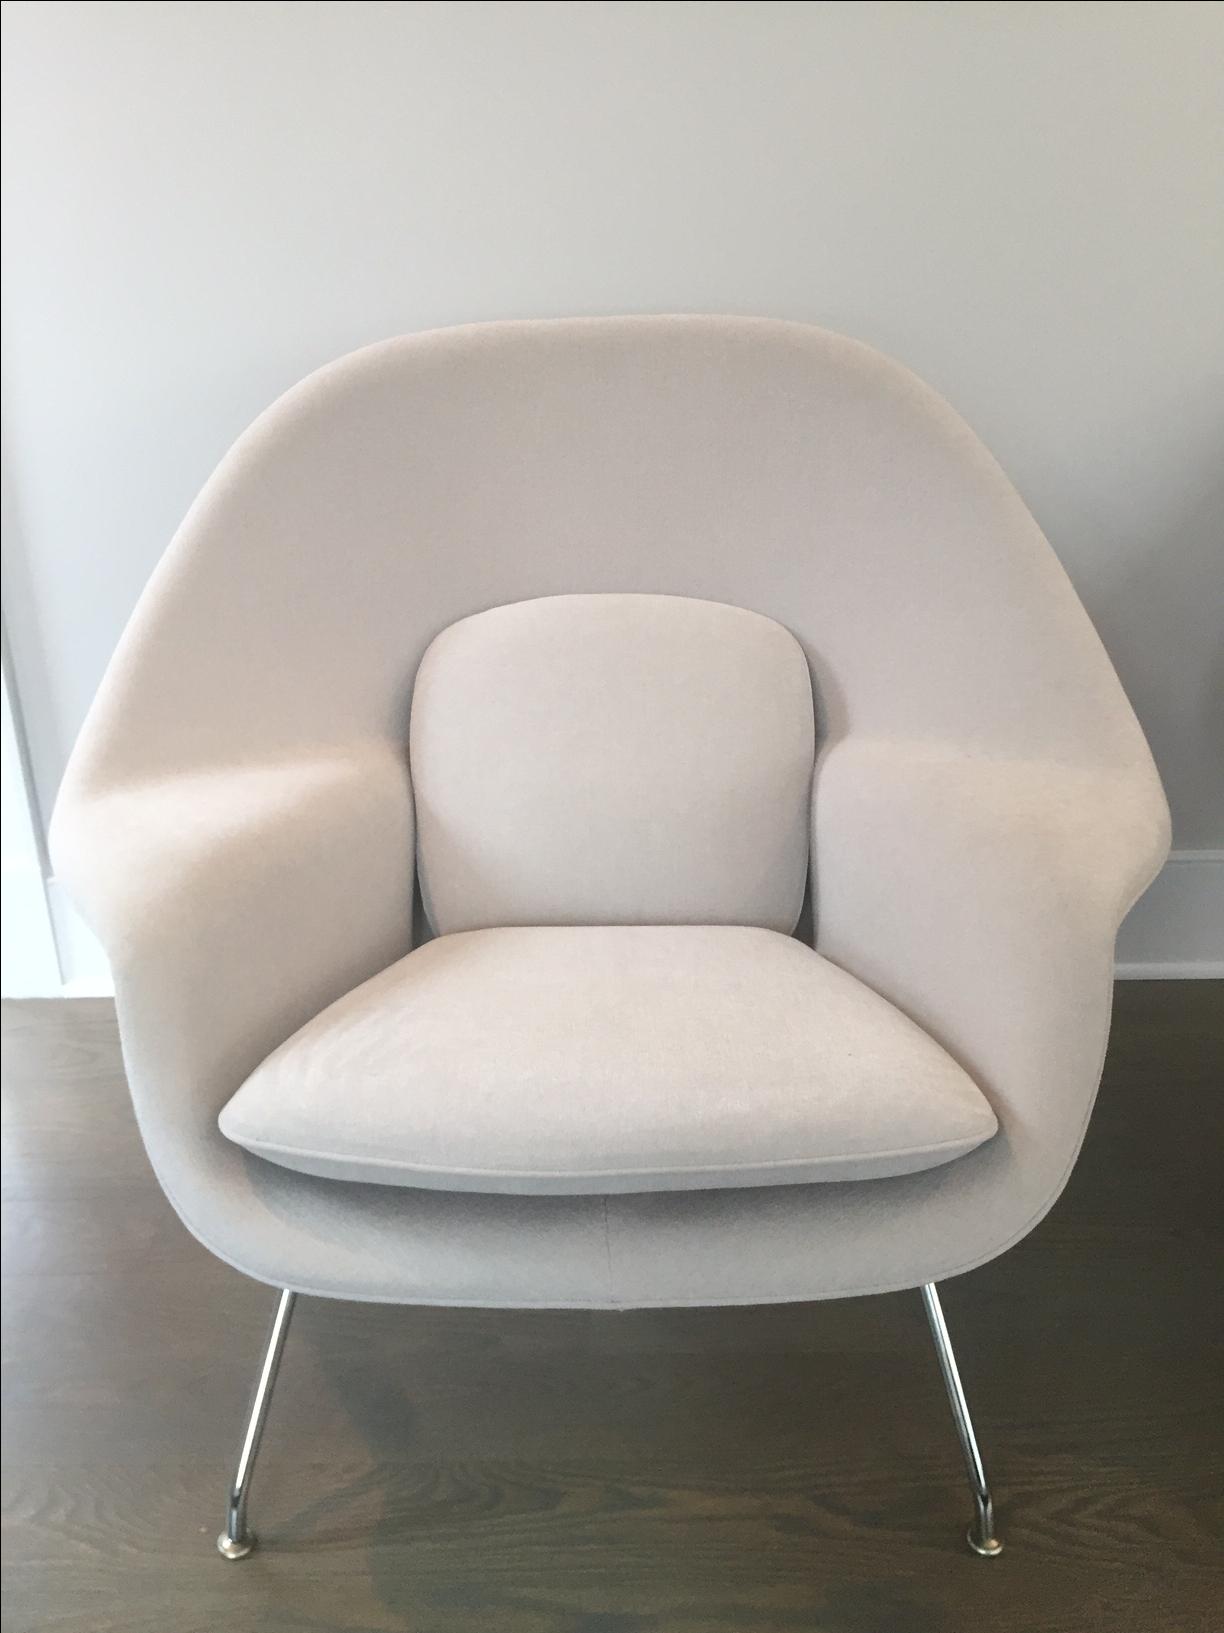 Gray Eero Saarinen Womb Chairs   A Pair   Image 4 Of 11